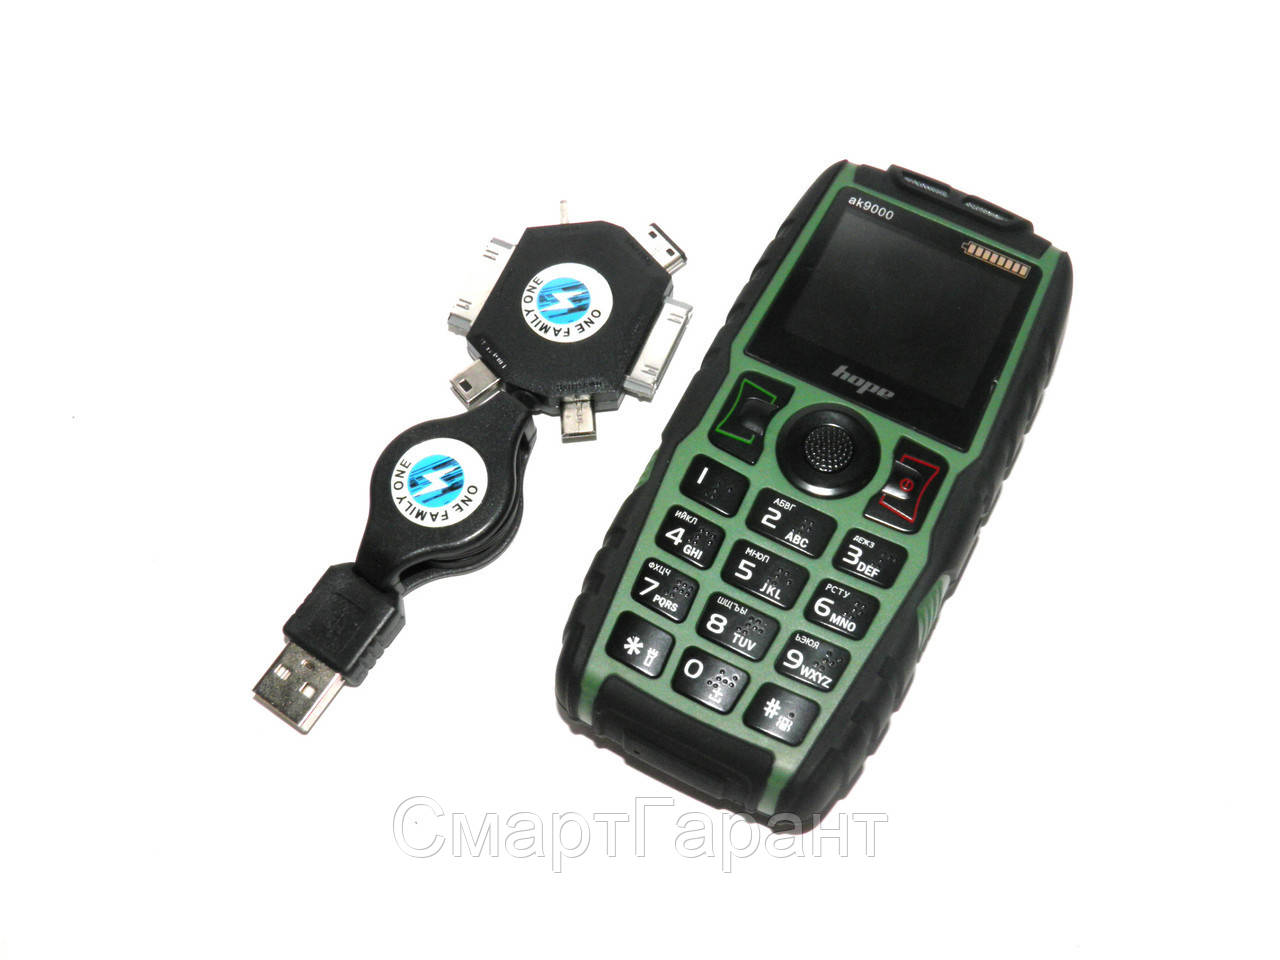 030215e1b749 Противоударный телефон Land Rover Ak 9000 ленд ровер на 2 сим-карты ...